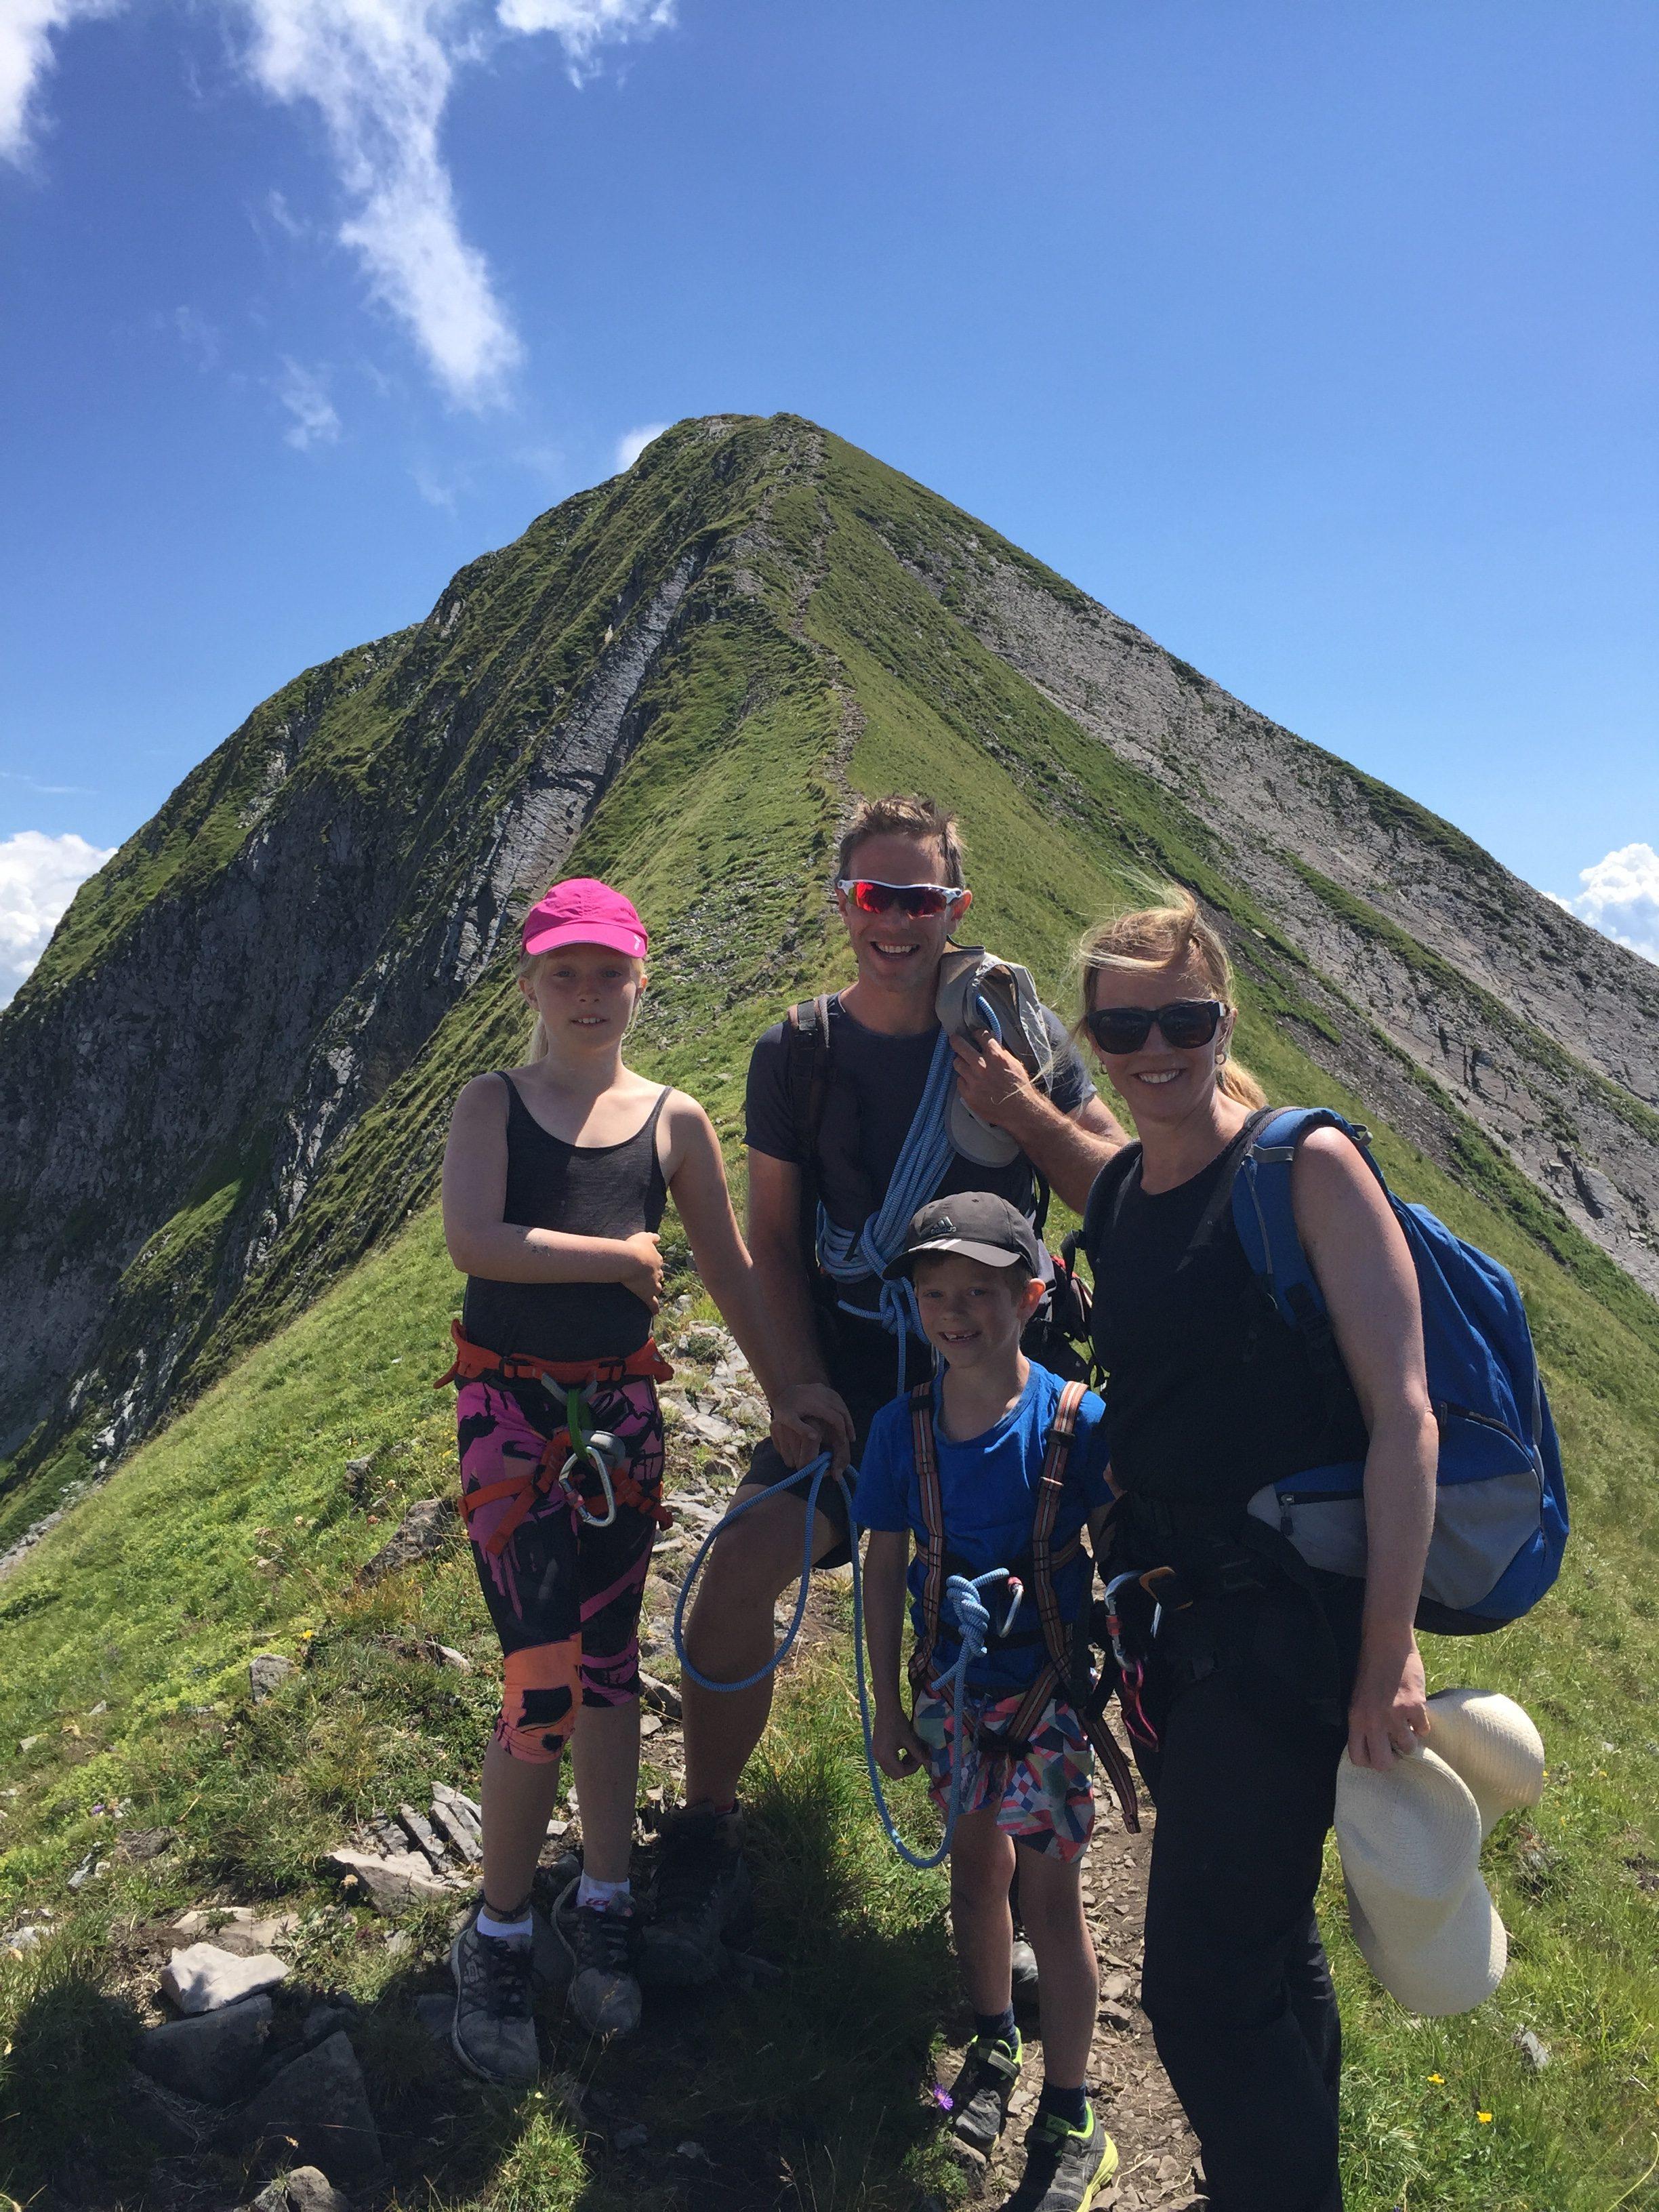 Bianca, Paul, Benjamin and Fiona climbing Mt Sharvin in France